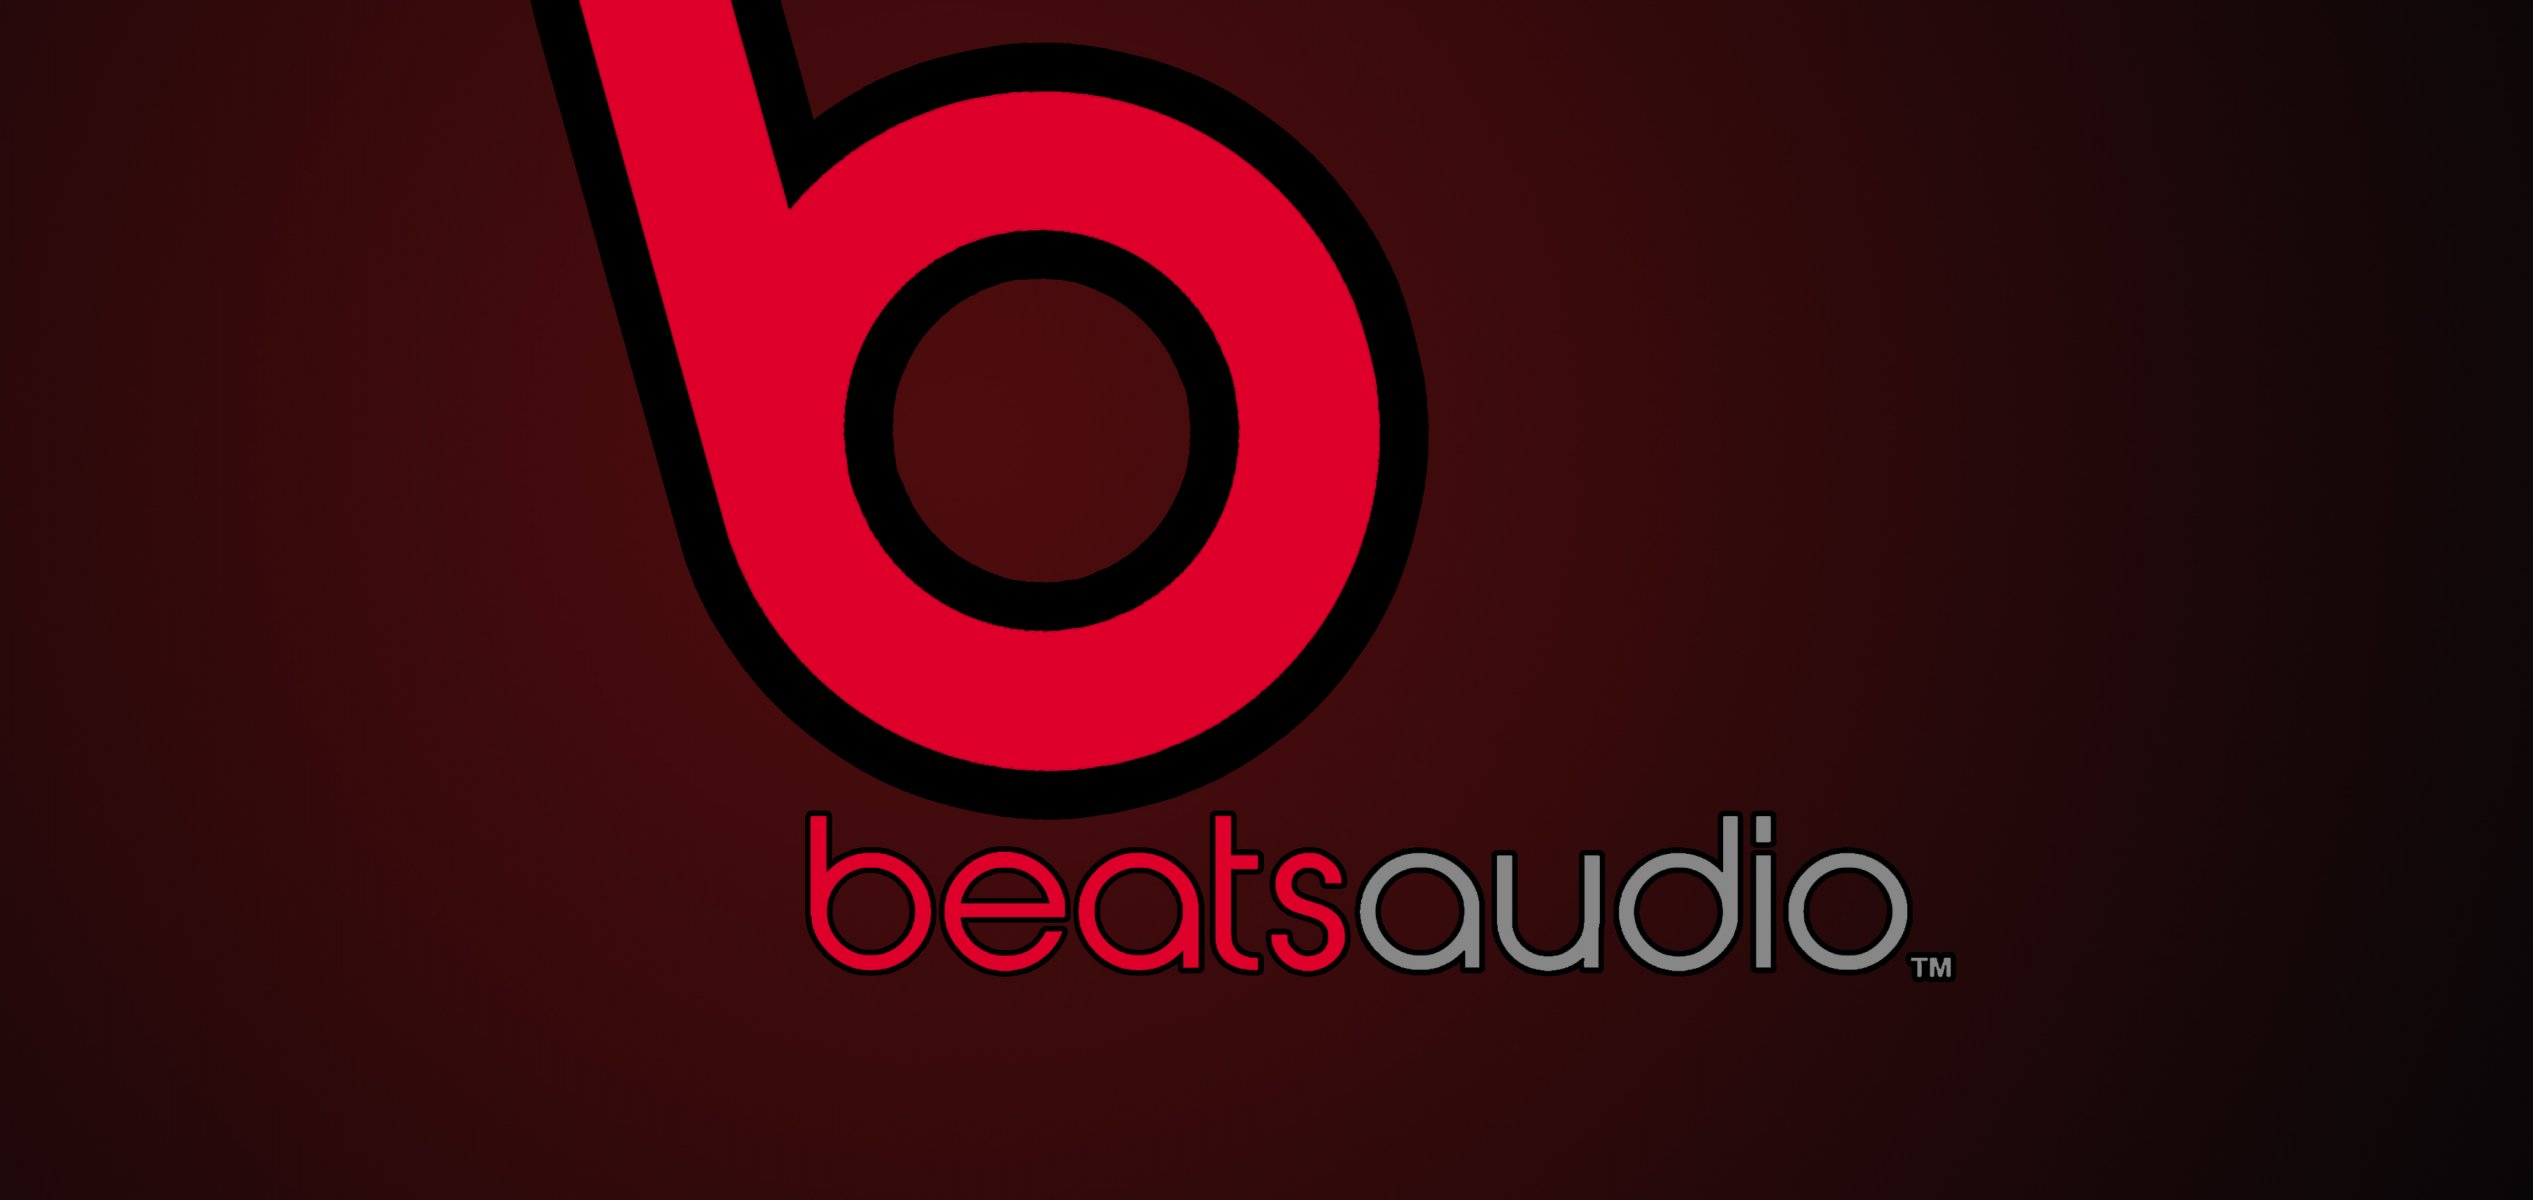 Beatsaudio Beats Audio Htc Dreaudio Drdre Beats